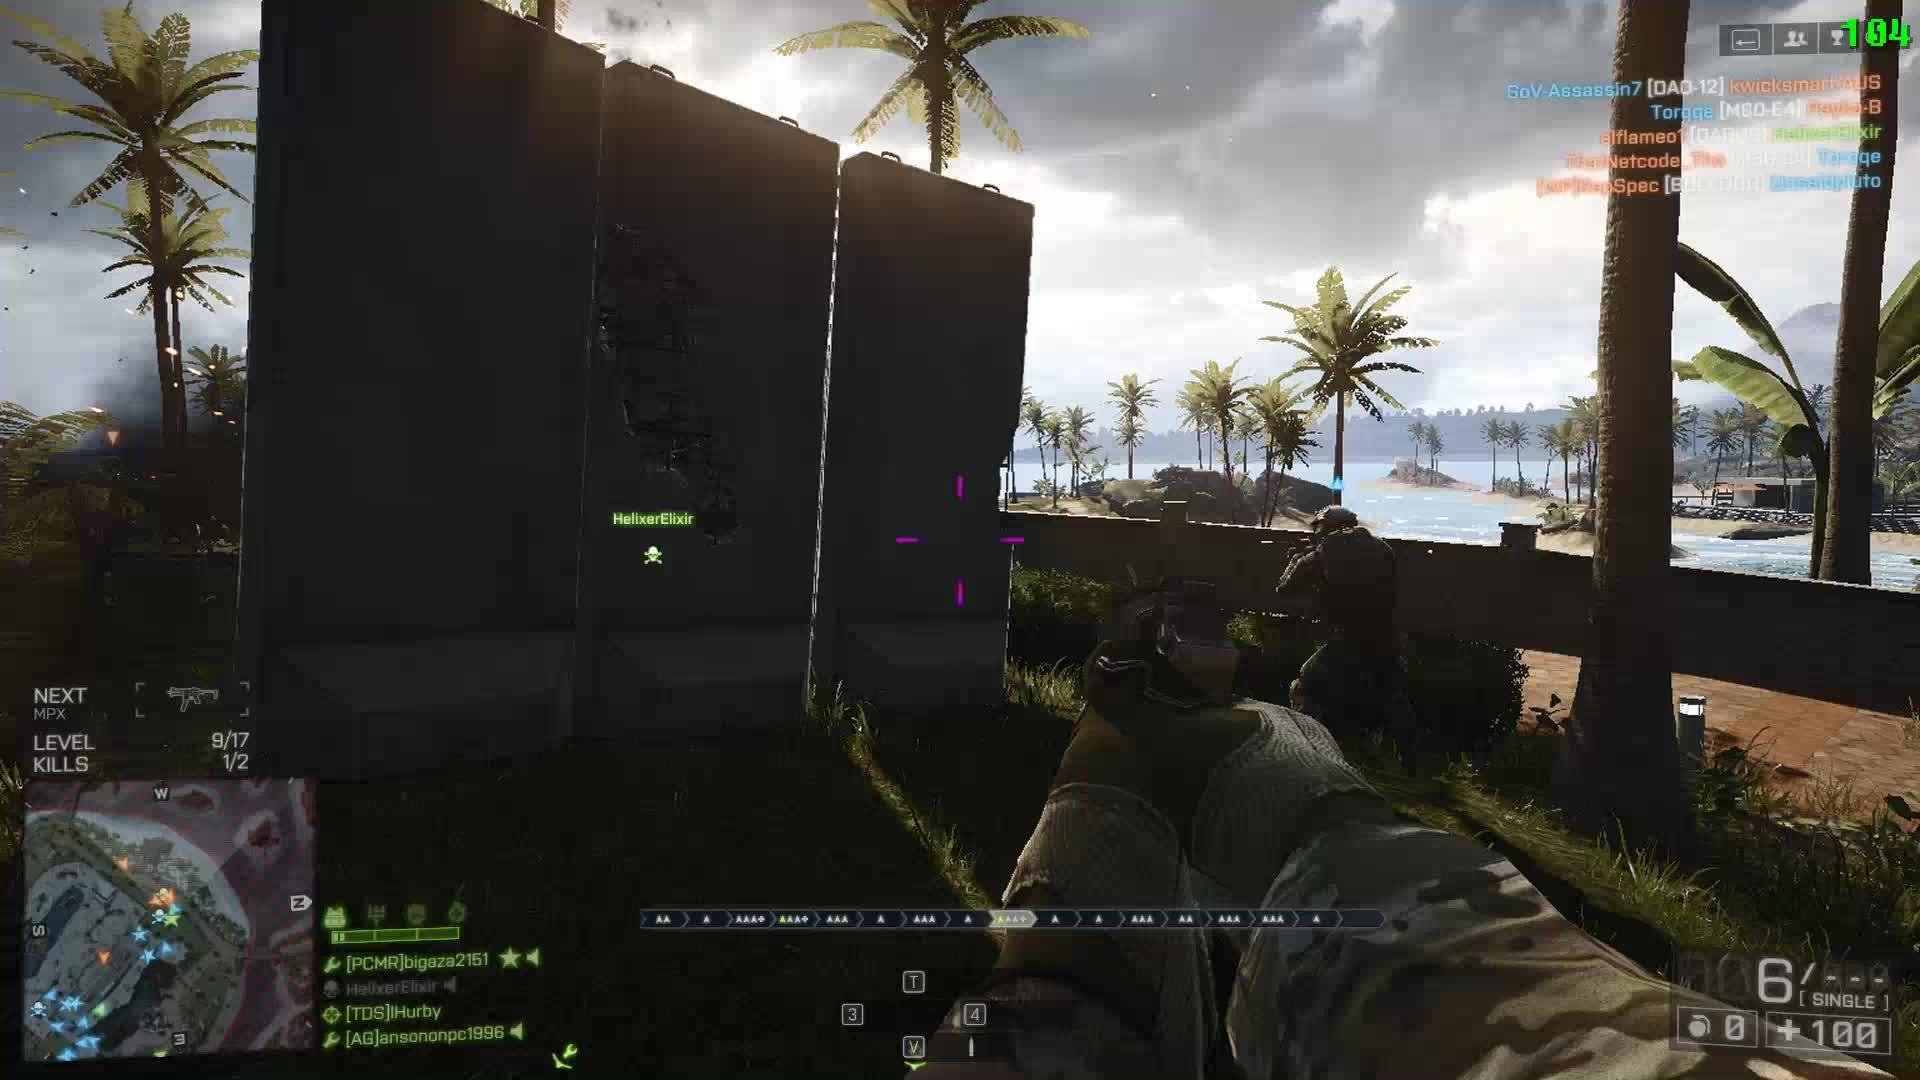 bf4, battlefield 4 GIFs